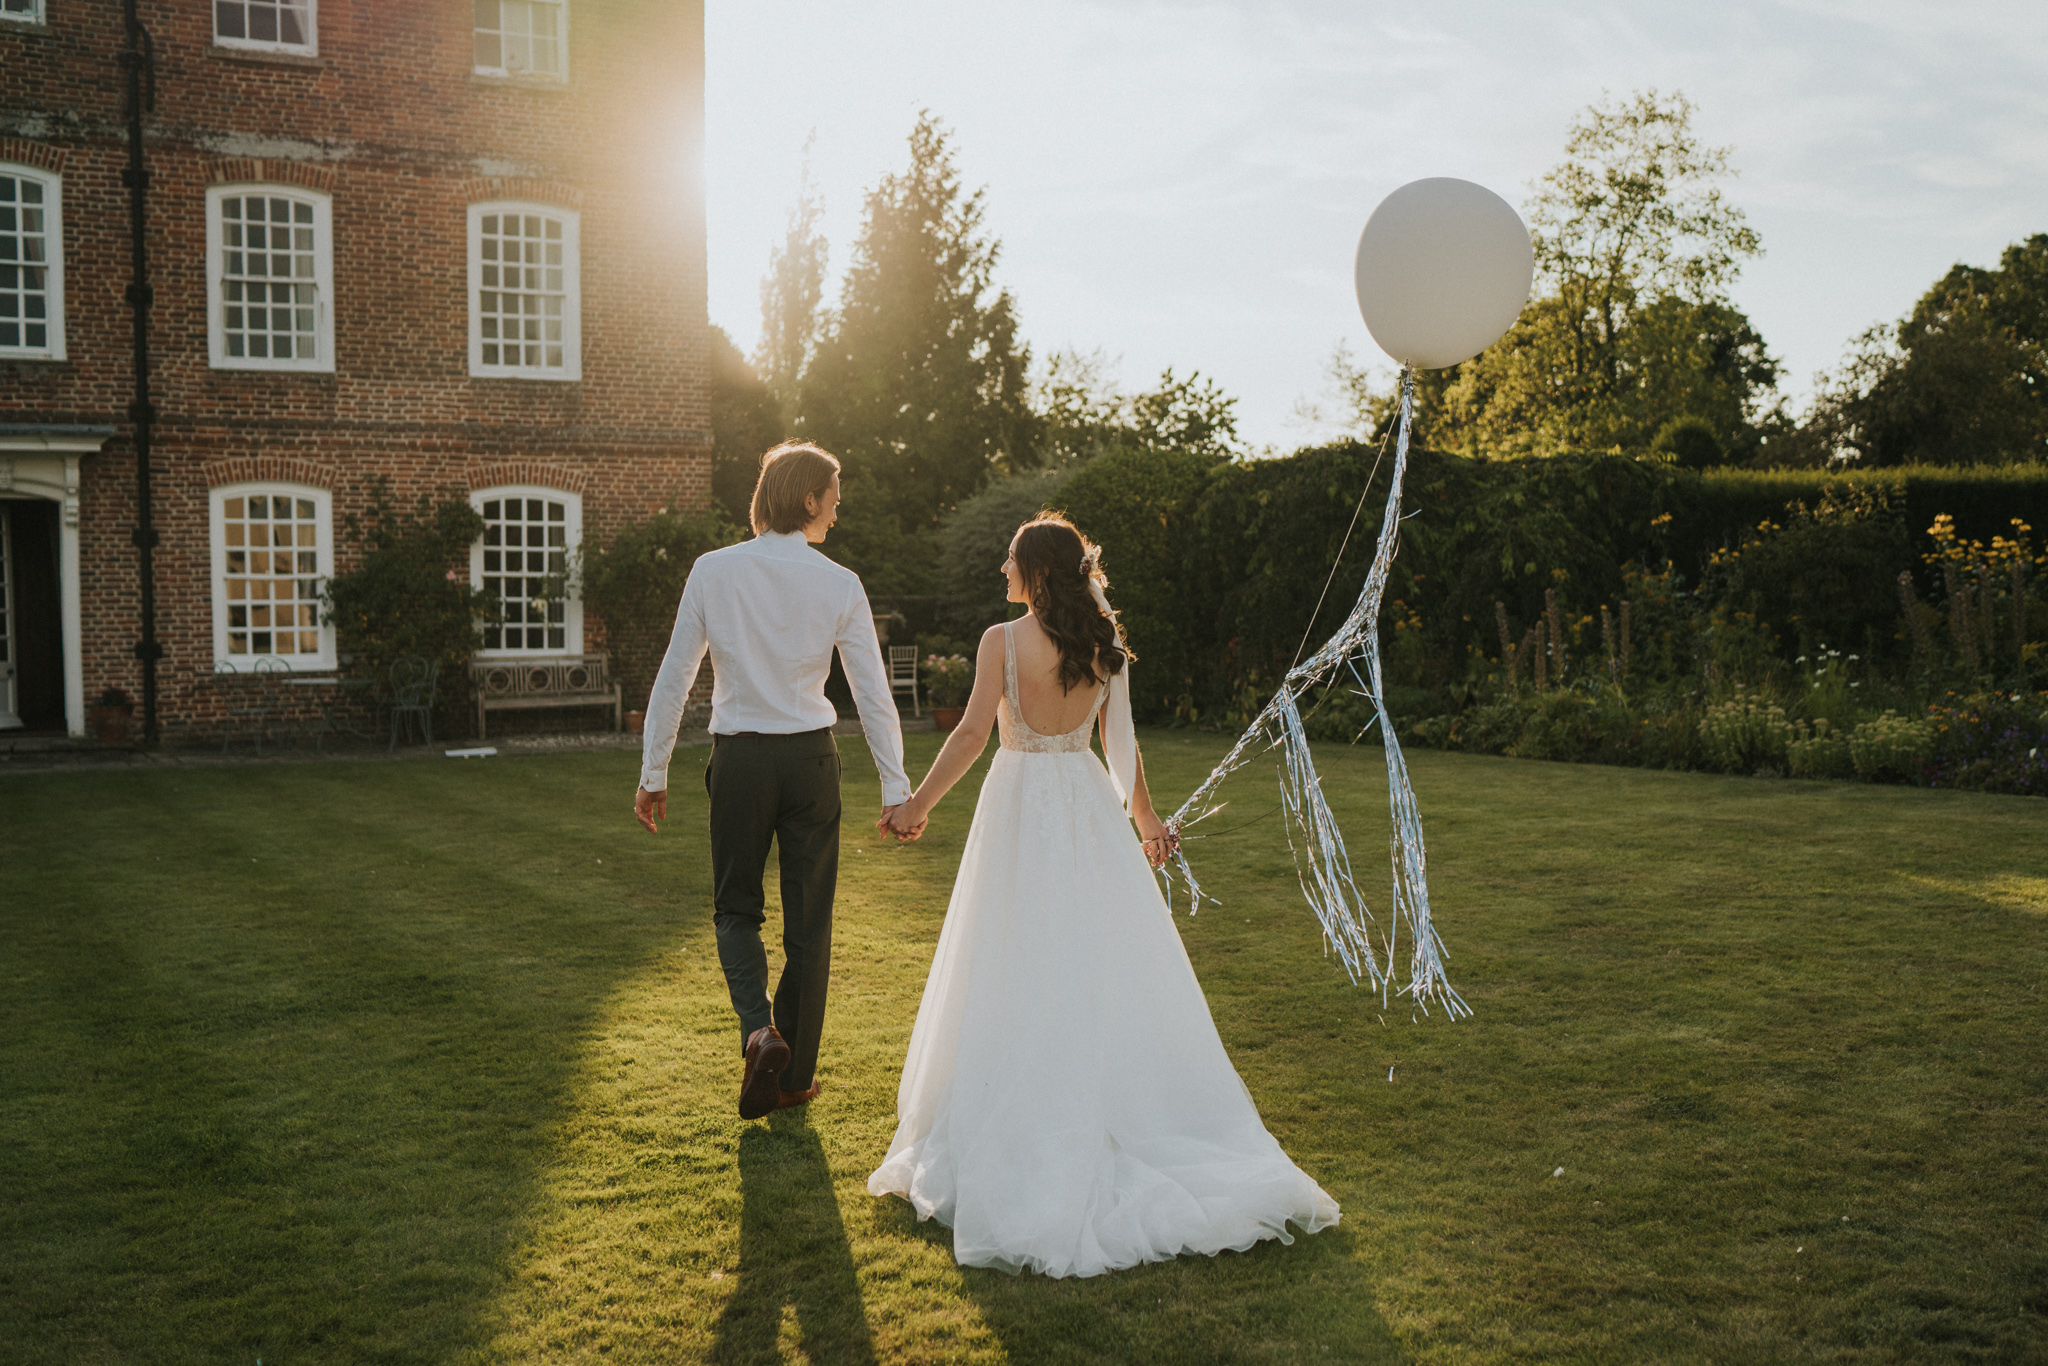 emi-Jack-boho-diy-wedding-eggington-house-grace-elizabeth-colchester-essex-alternative-wedding-photographer-suffolk-norfolk-devon (48 of 56).jpg